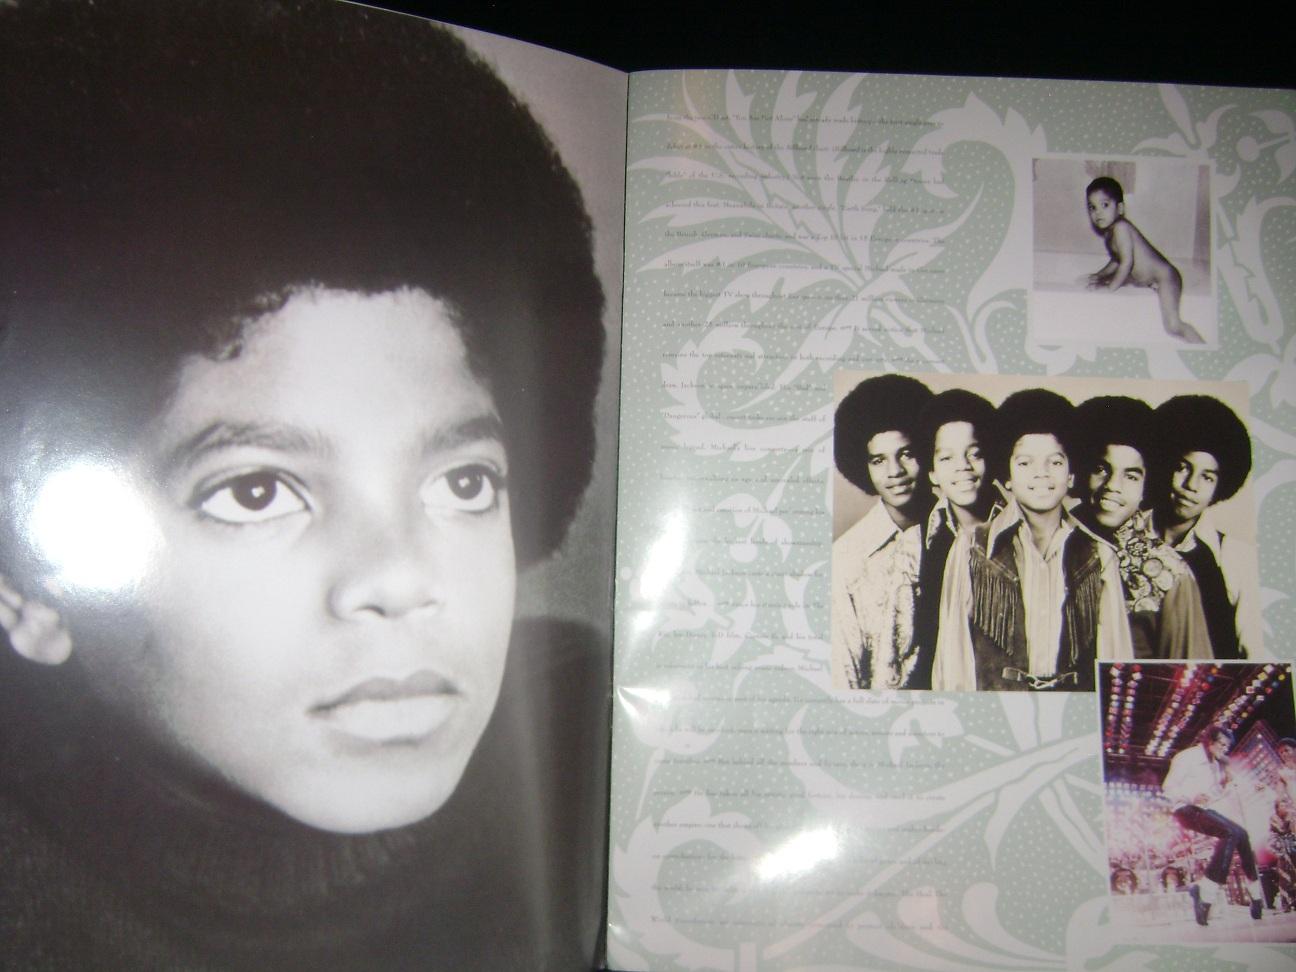 Michael_Jackson_King_of_pop_2.JPG